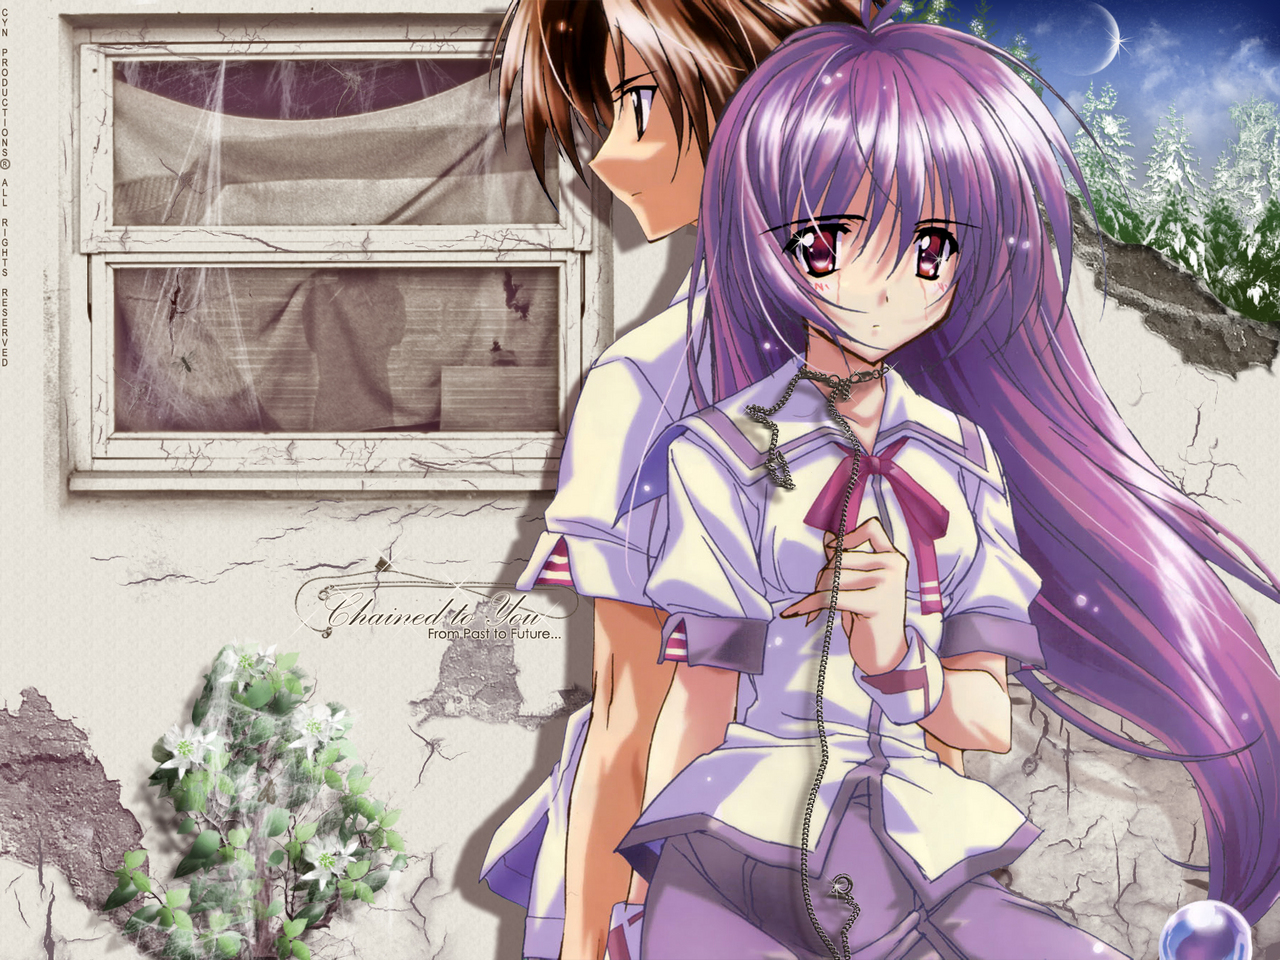 asaba_naoyuki brown_eyes brown_hair iriya_kana iriya_no_sora_ufo_no_natsu long_hair necklace purple_hair red_eyes school_uniform short_hair